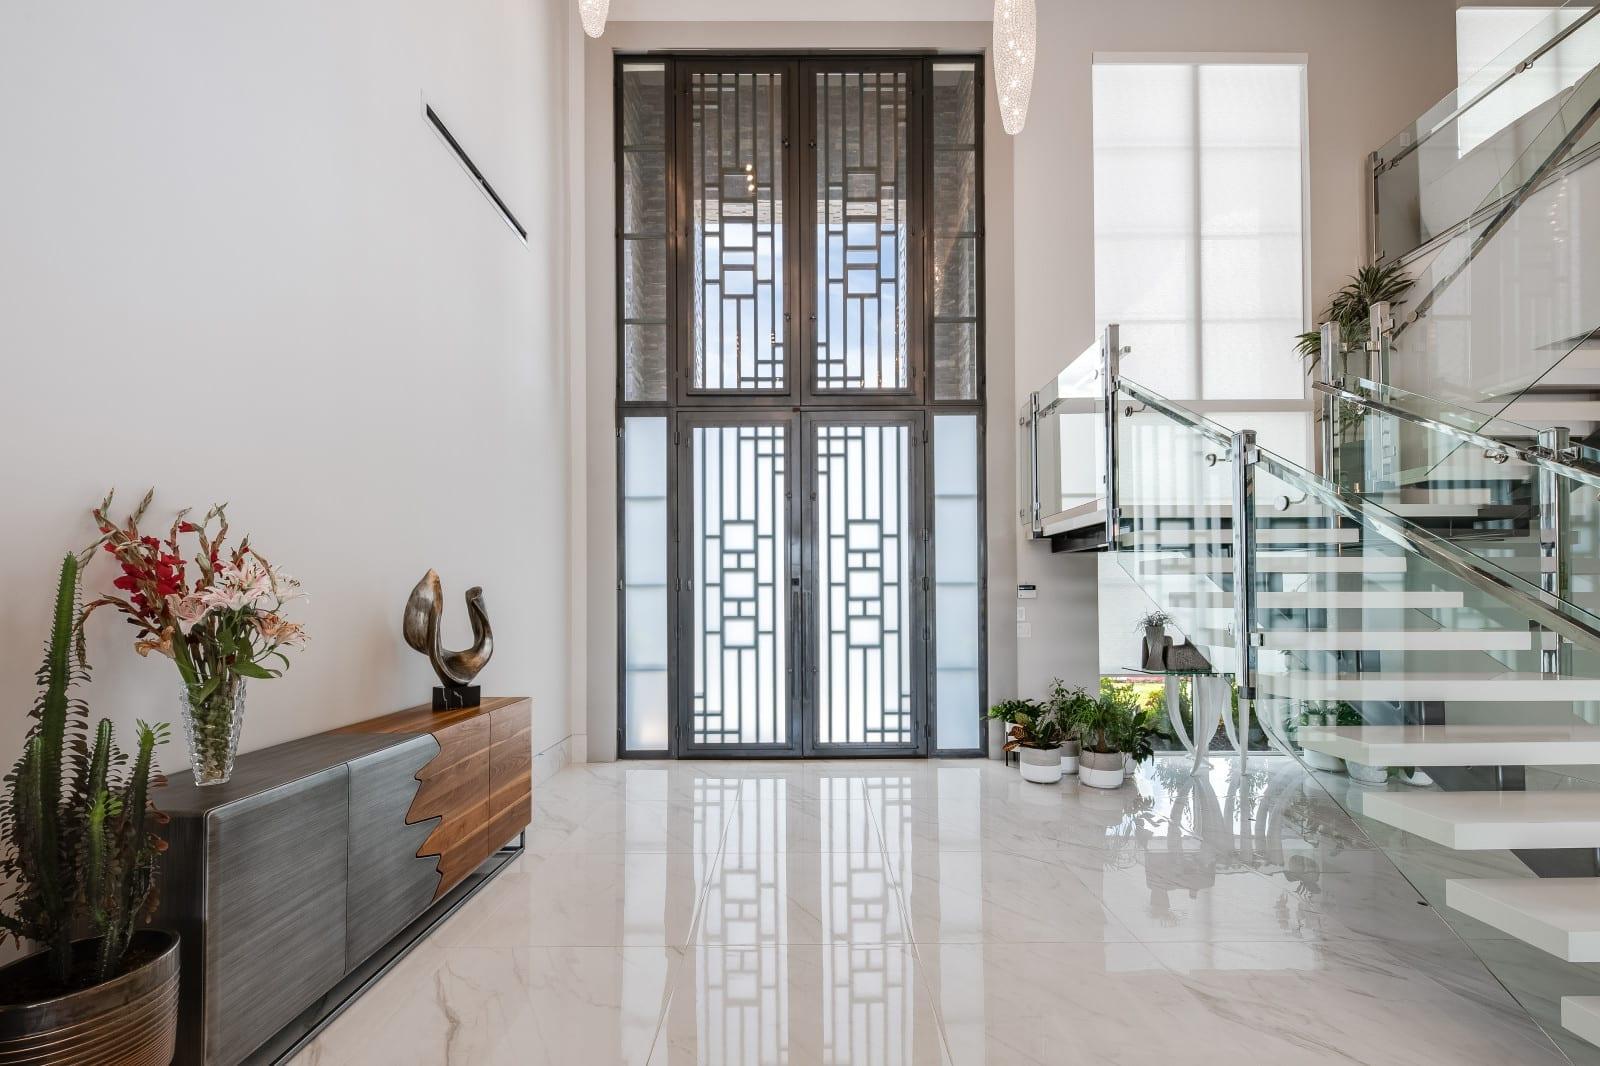 Custom Home Build and Interior Design # 1 - Millennial Design + Build, Custom Home Builders in Dallas Texas, modern style homes, Property Evaluator, Interior Designers, using BIM Technology and Home 3D Model.